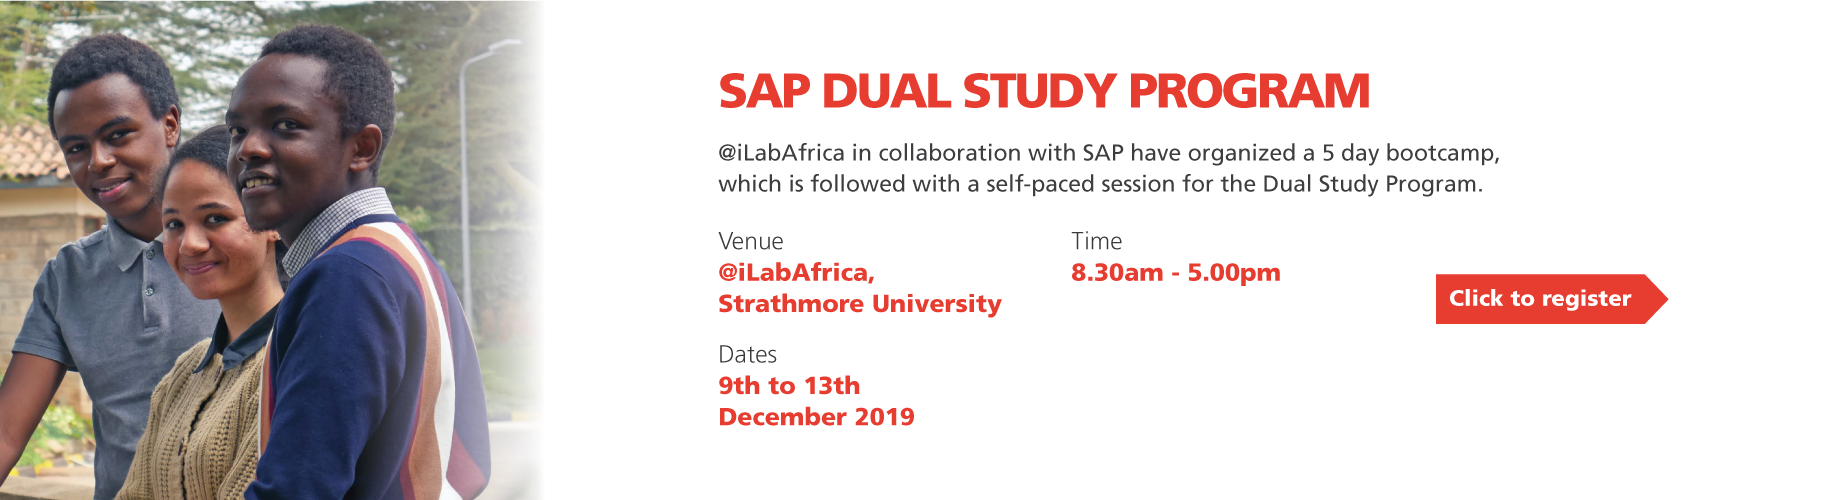 2SAP-DUAL-STUDY-PROGRAM-021